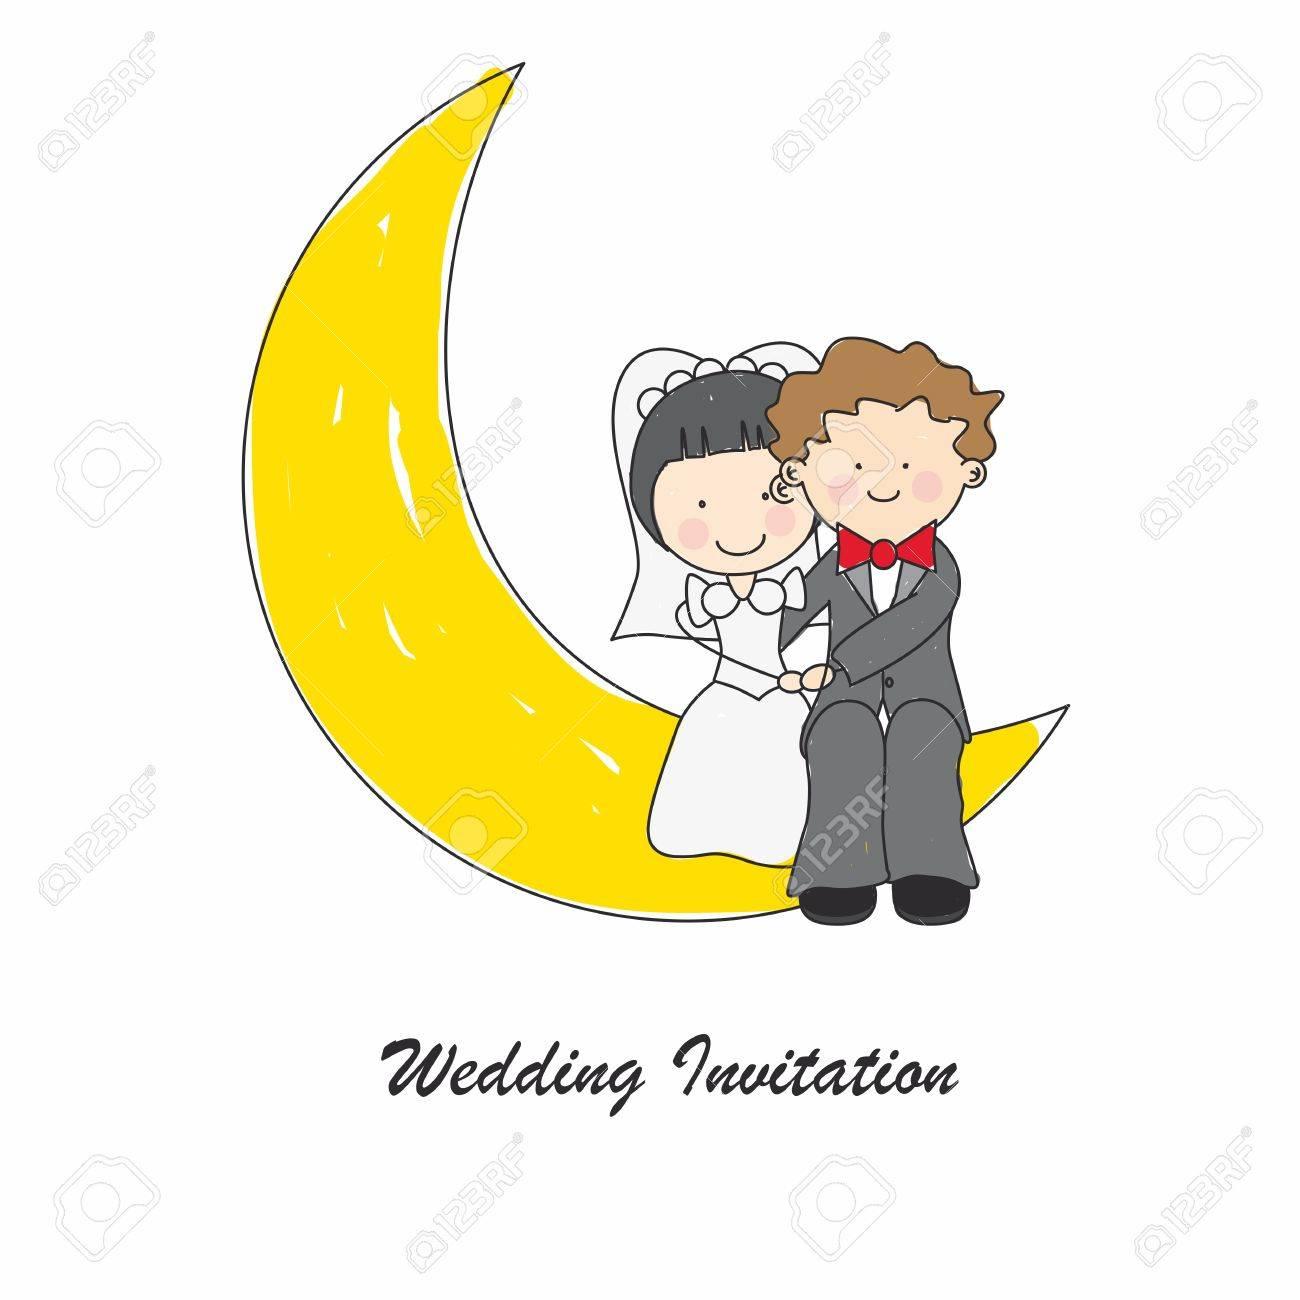 Wedding invitation card Stock Vector - 11300441